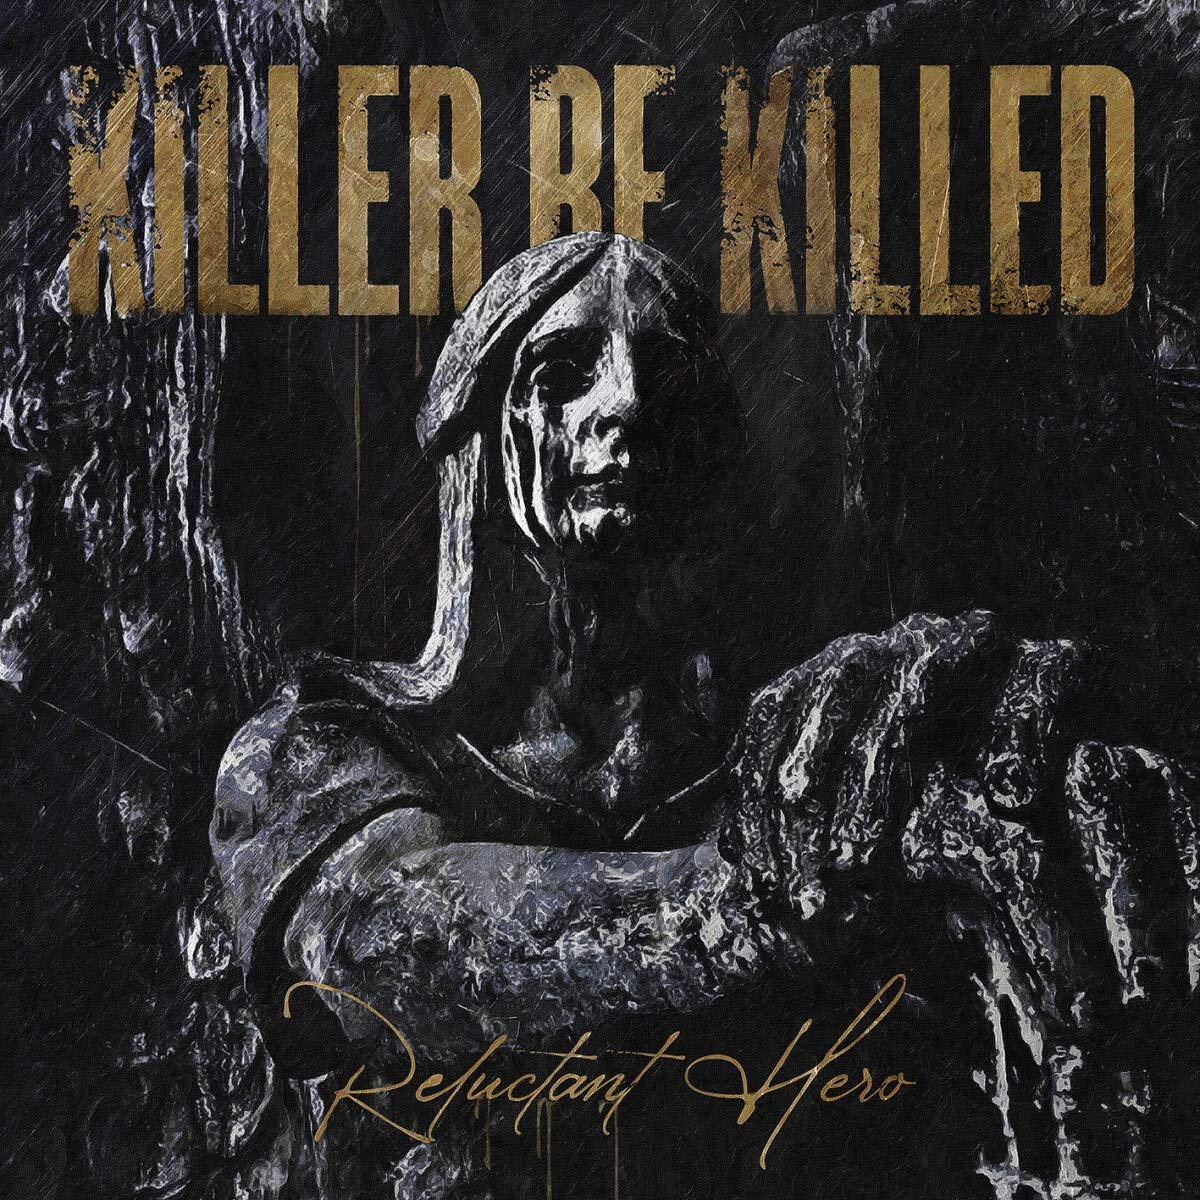 Killer Be Killed Albumcover